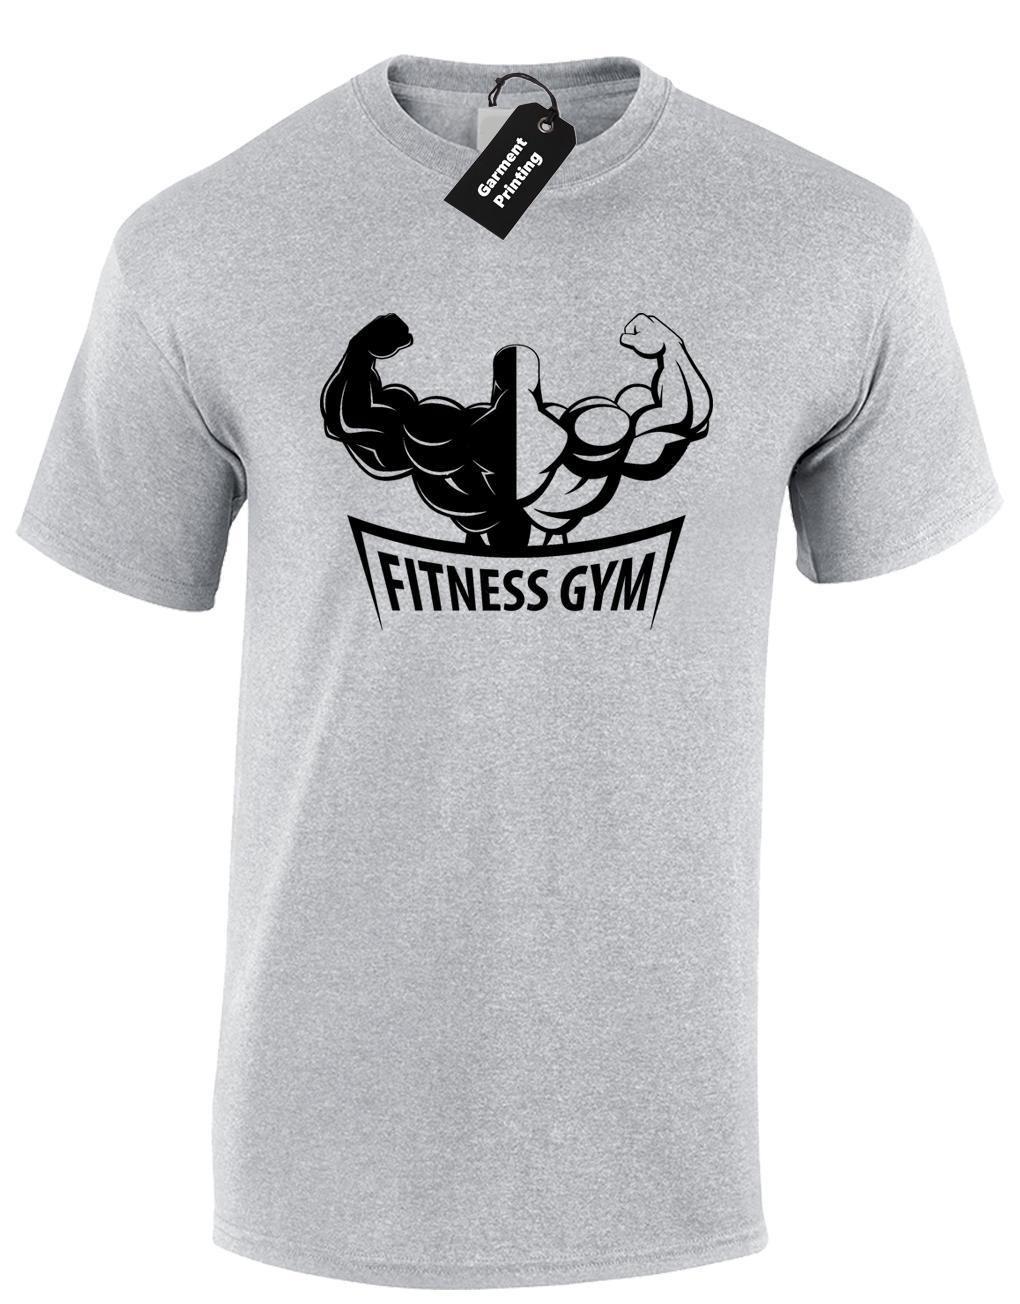 83a61da21 FITNESS GYM MENS T SHIRT TRAINING TOP CROSSFIT MMA RUNNER MUSCLE TOP S 5XL  Shirts Mens Cool T Shirts Designs From Linnan00010, $14.67  DHgate.Com